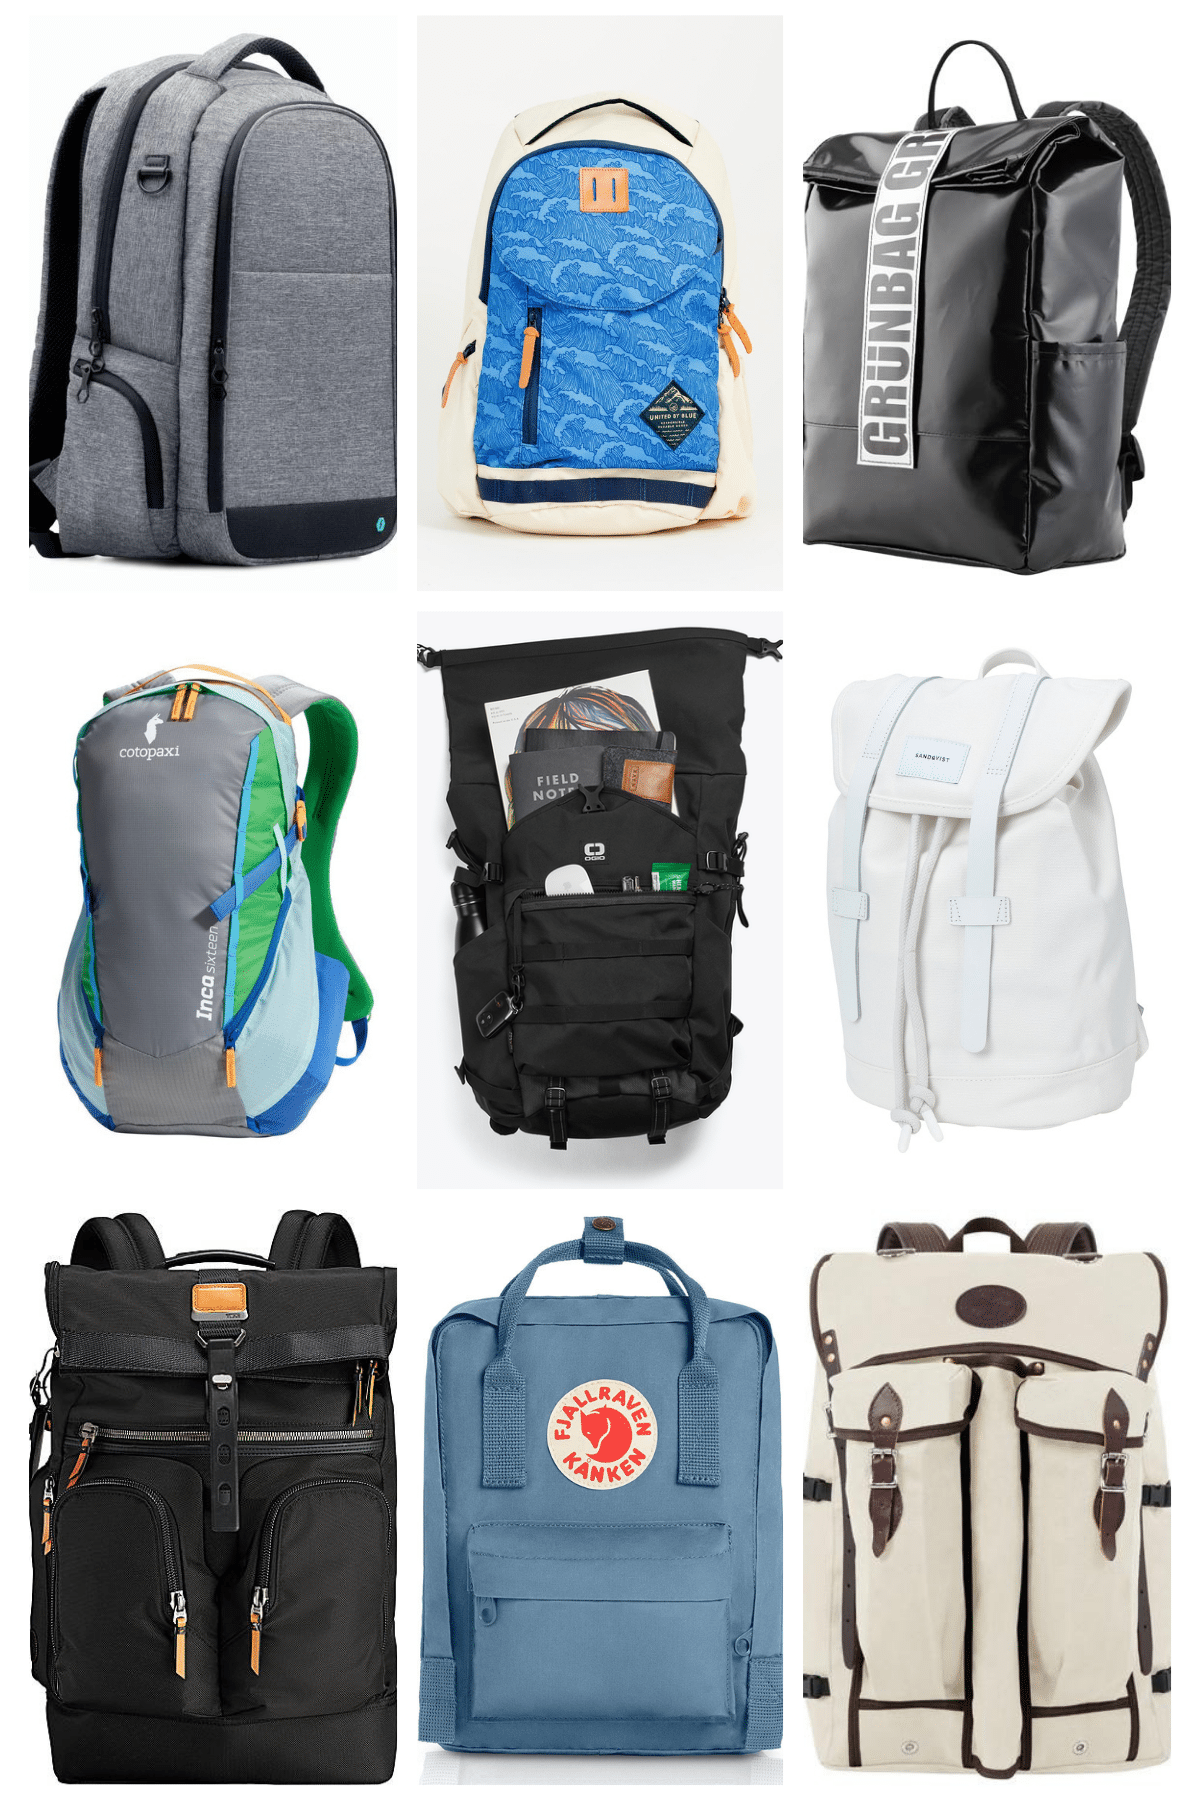 Travel Bag School Bag Backpack Storage Bag For Men Women Girls Boys Personalized Pattern Snowy Road Shopping Bag